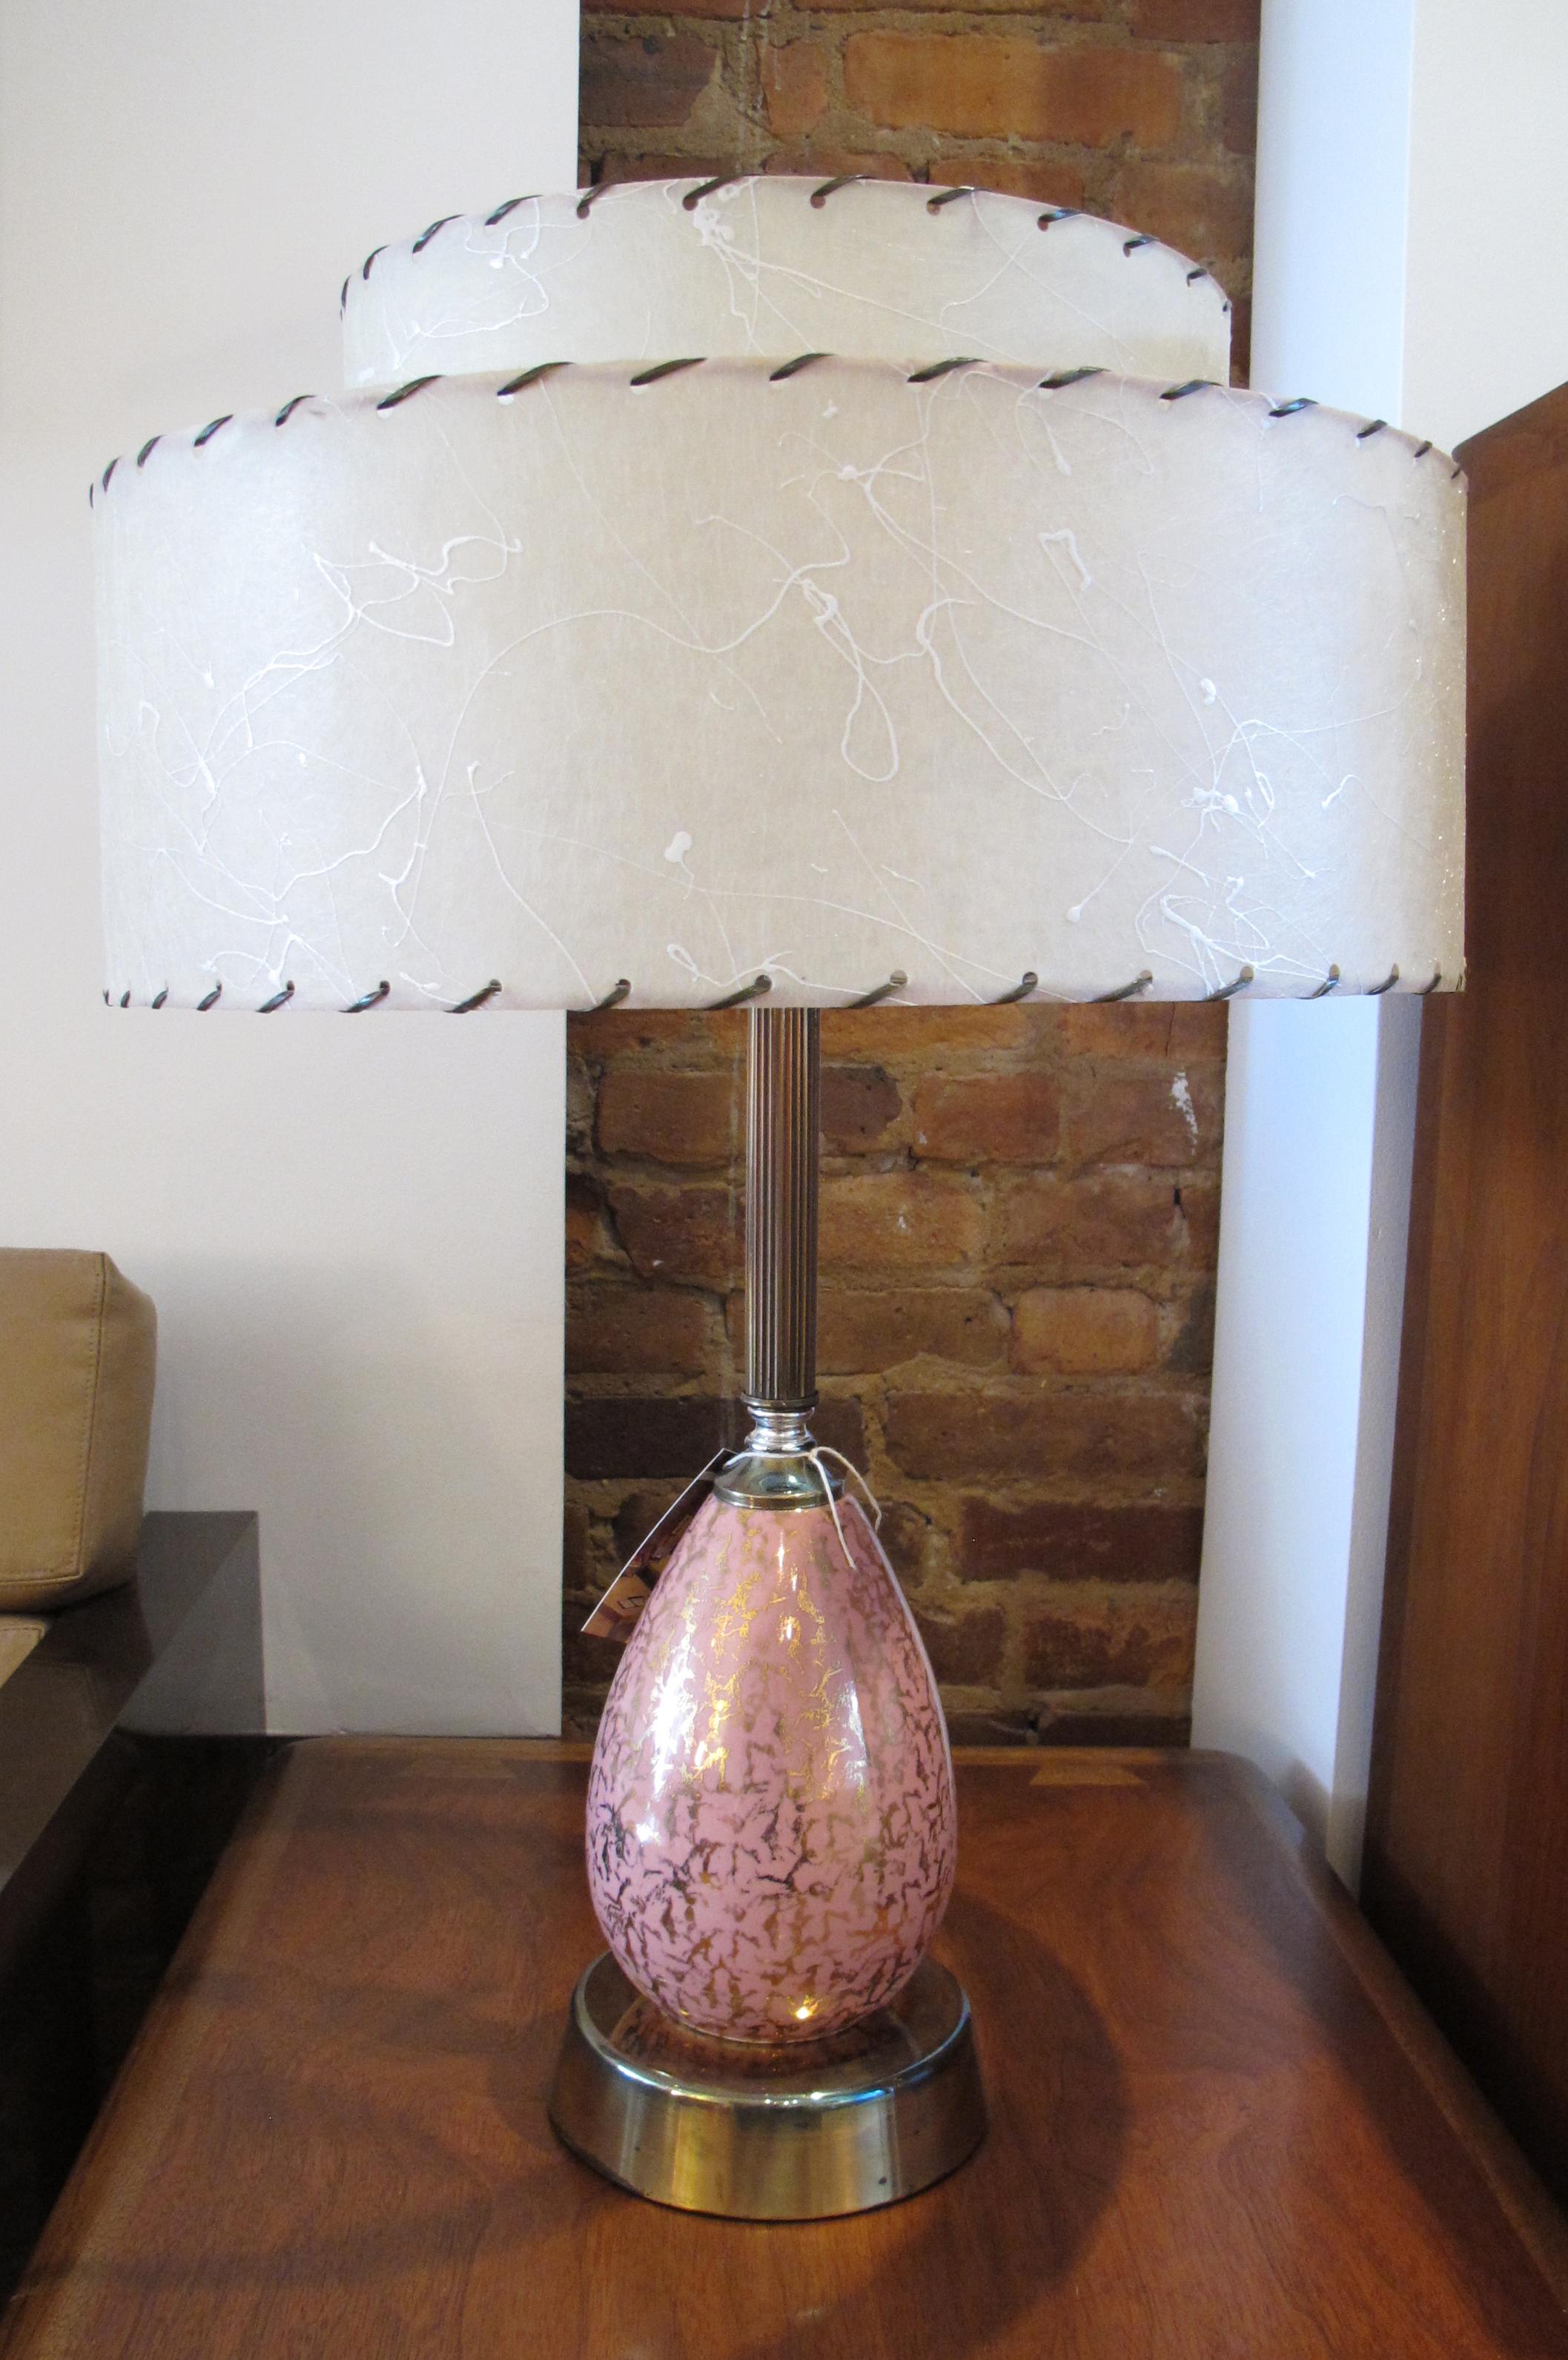 MID CENTURY PINK & GOLD ATOMIC LAMP WITH FIBERGLASS SHADE